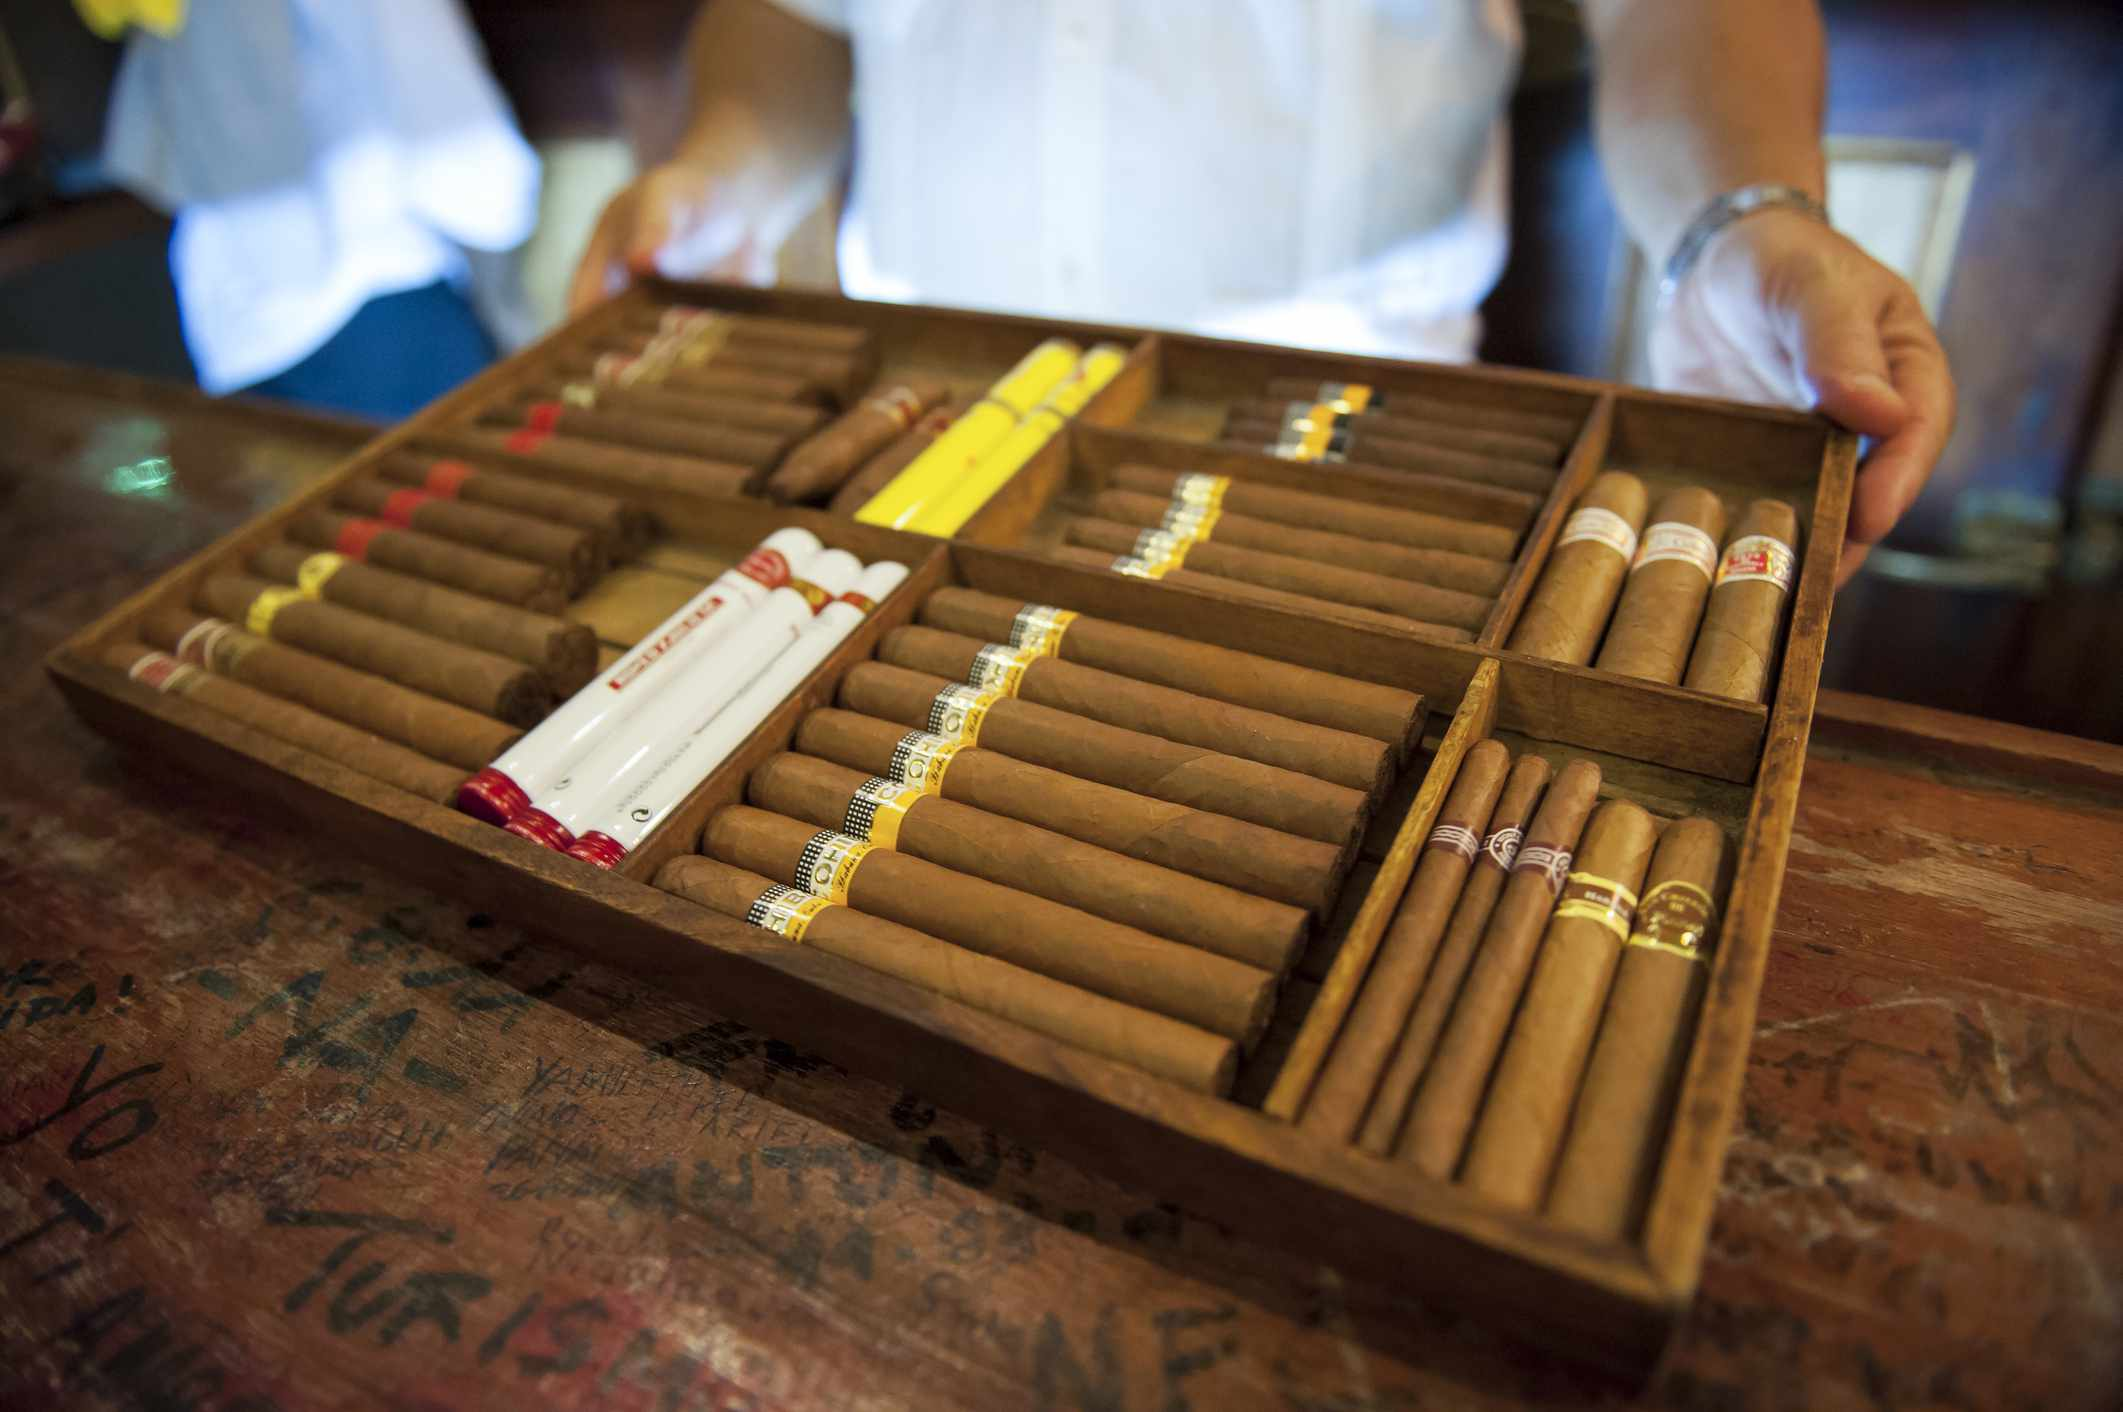 Cigars for sale at a cigar bar